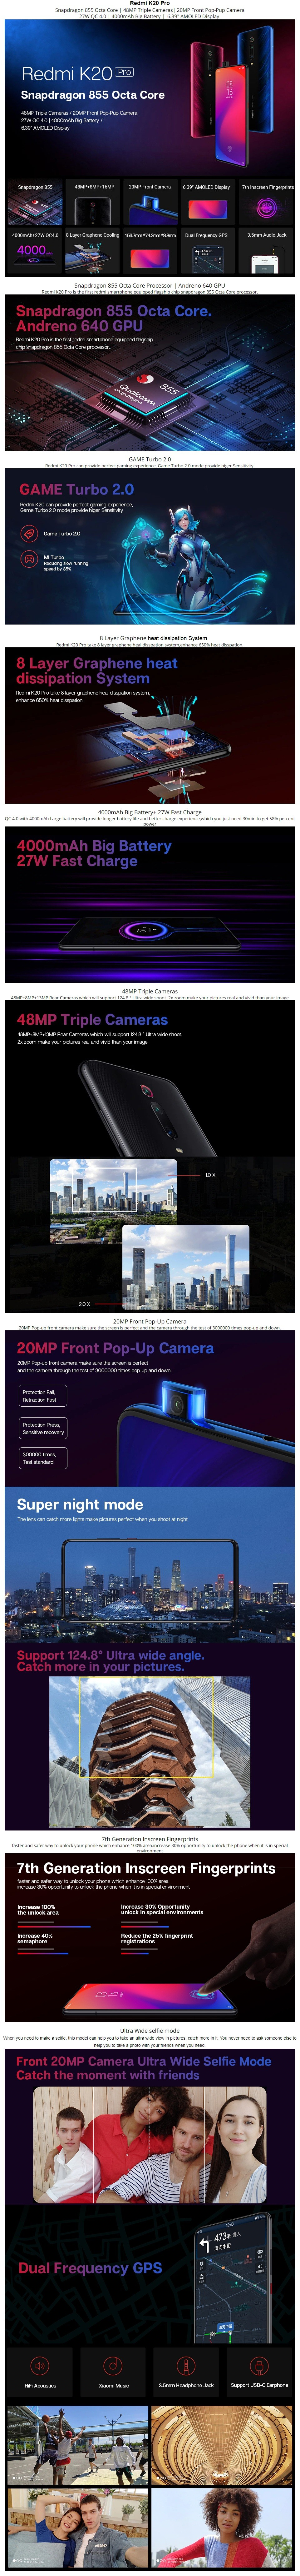 prezentare-xiaomi-k209f98b60c084ba3ab.jpg